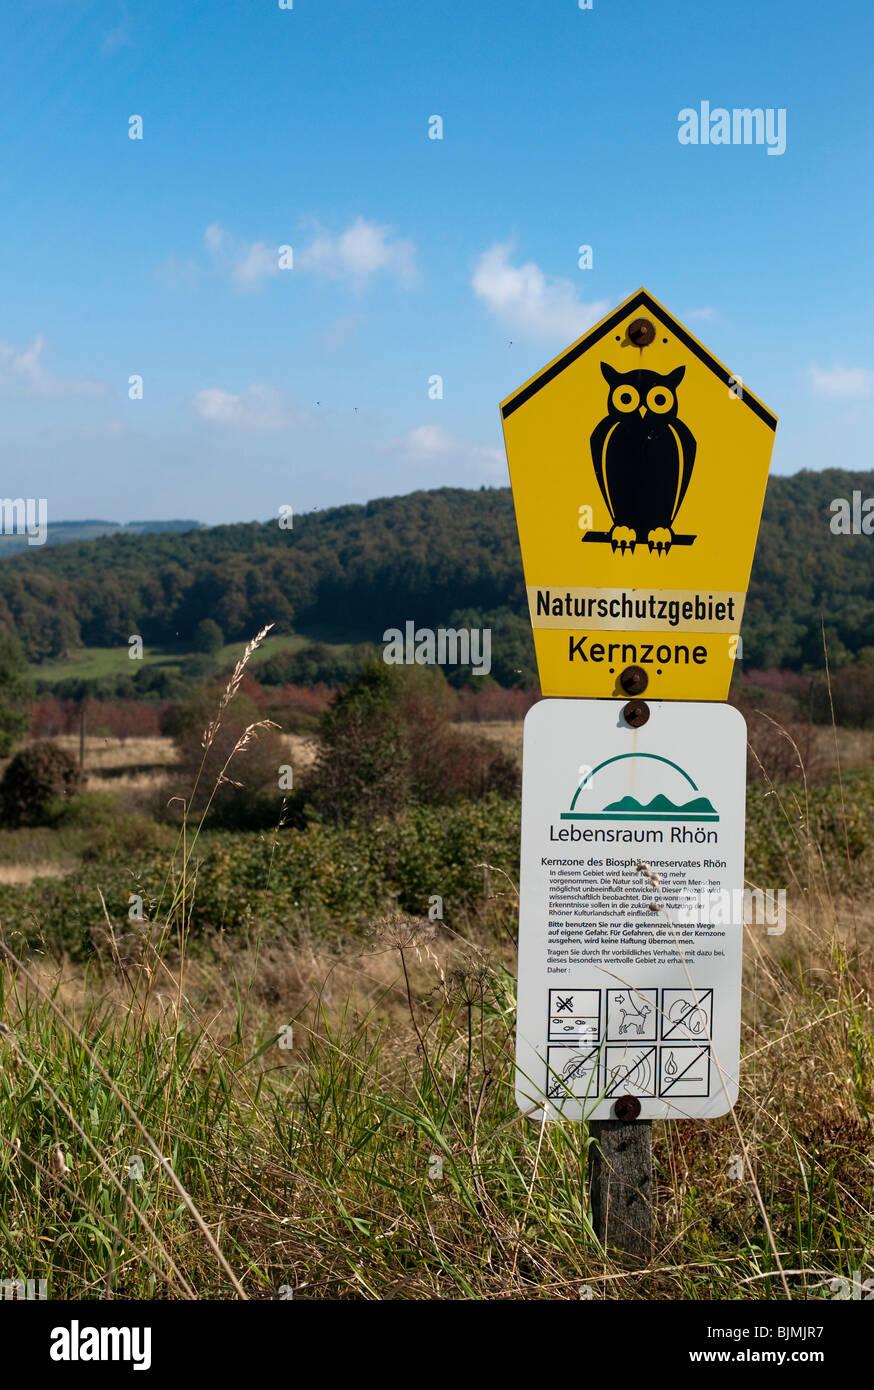 Hessian Rhoen Nature Reserve, Rhoen Biosphere Reserve, East Hesse, Hesse, Germany, Europe Stock Photo